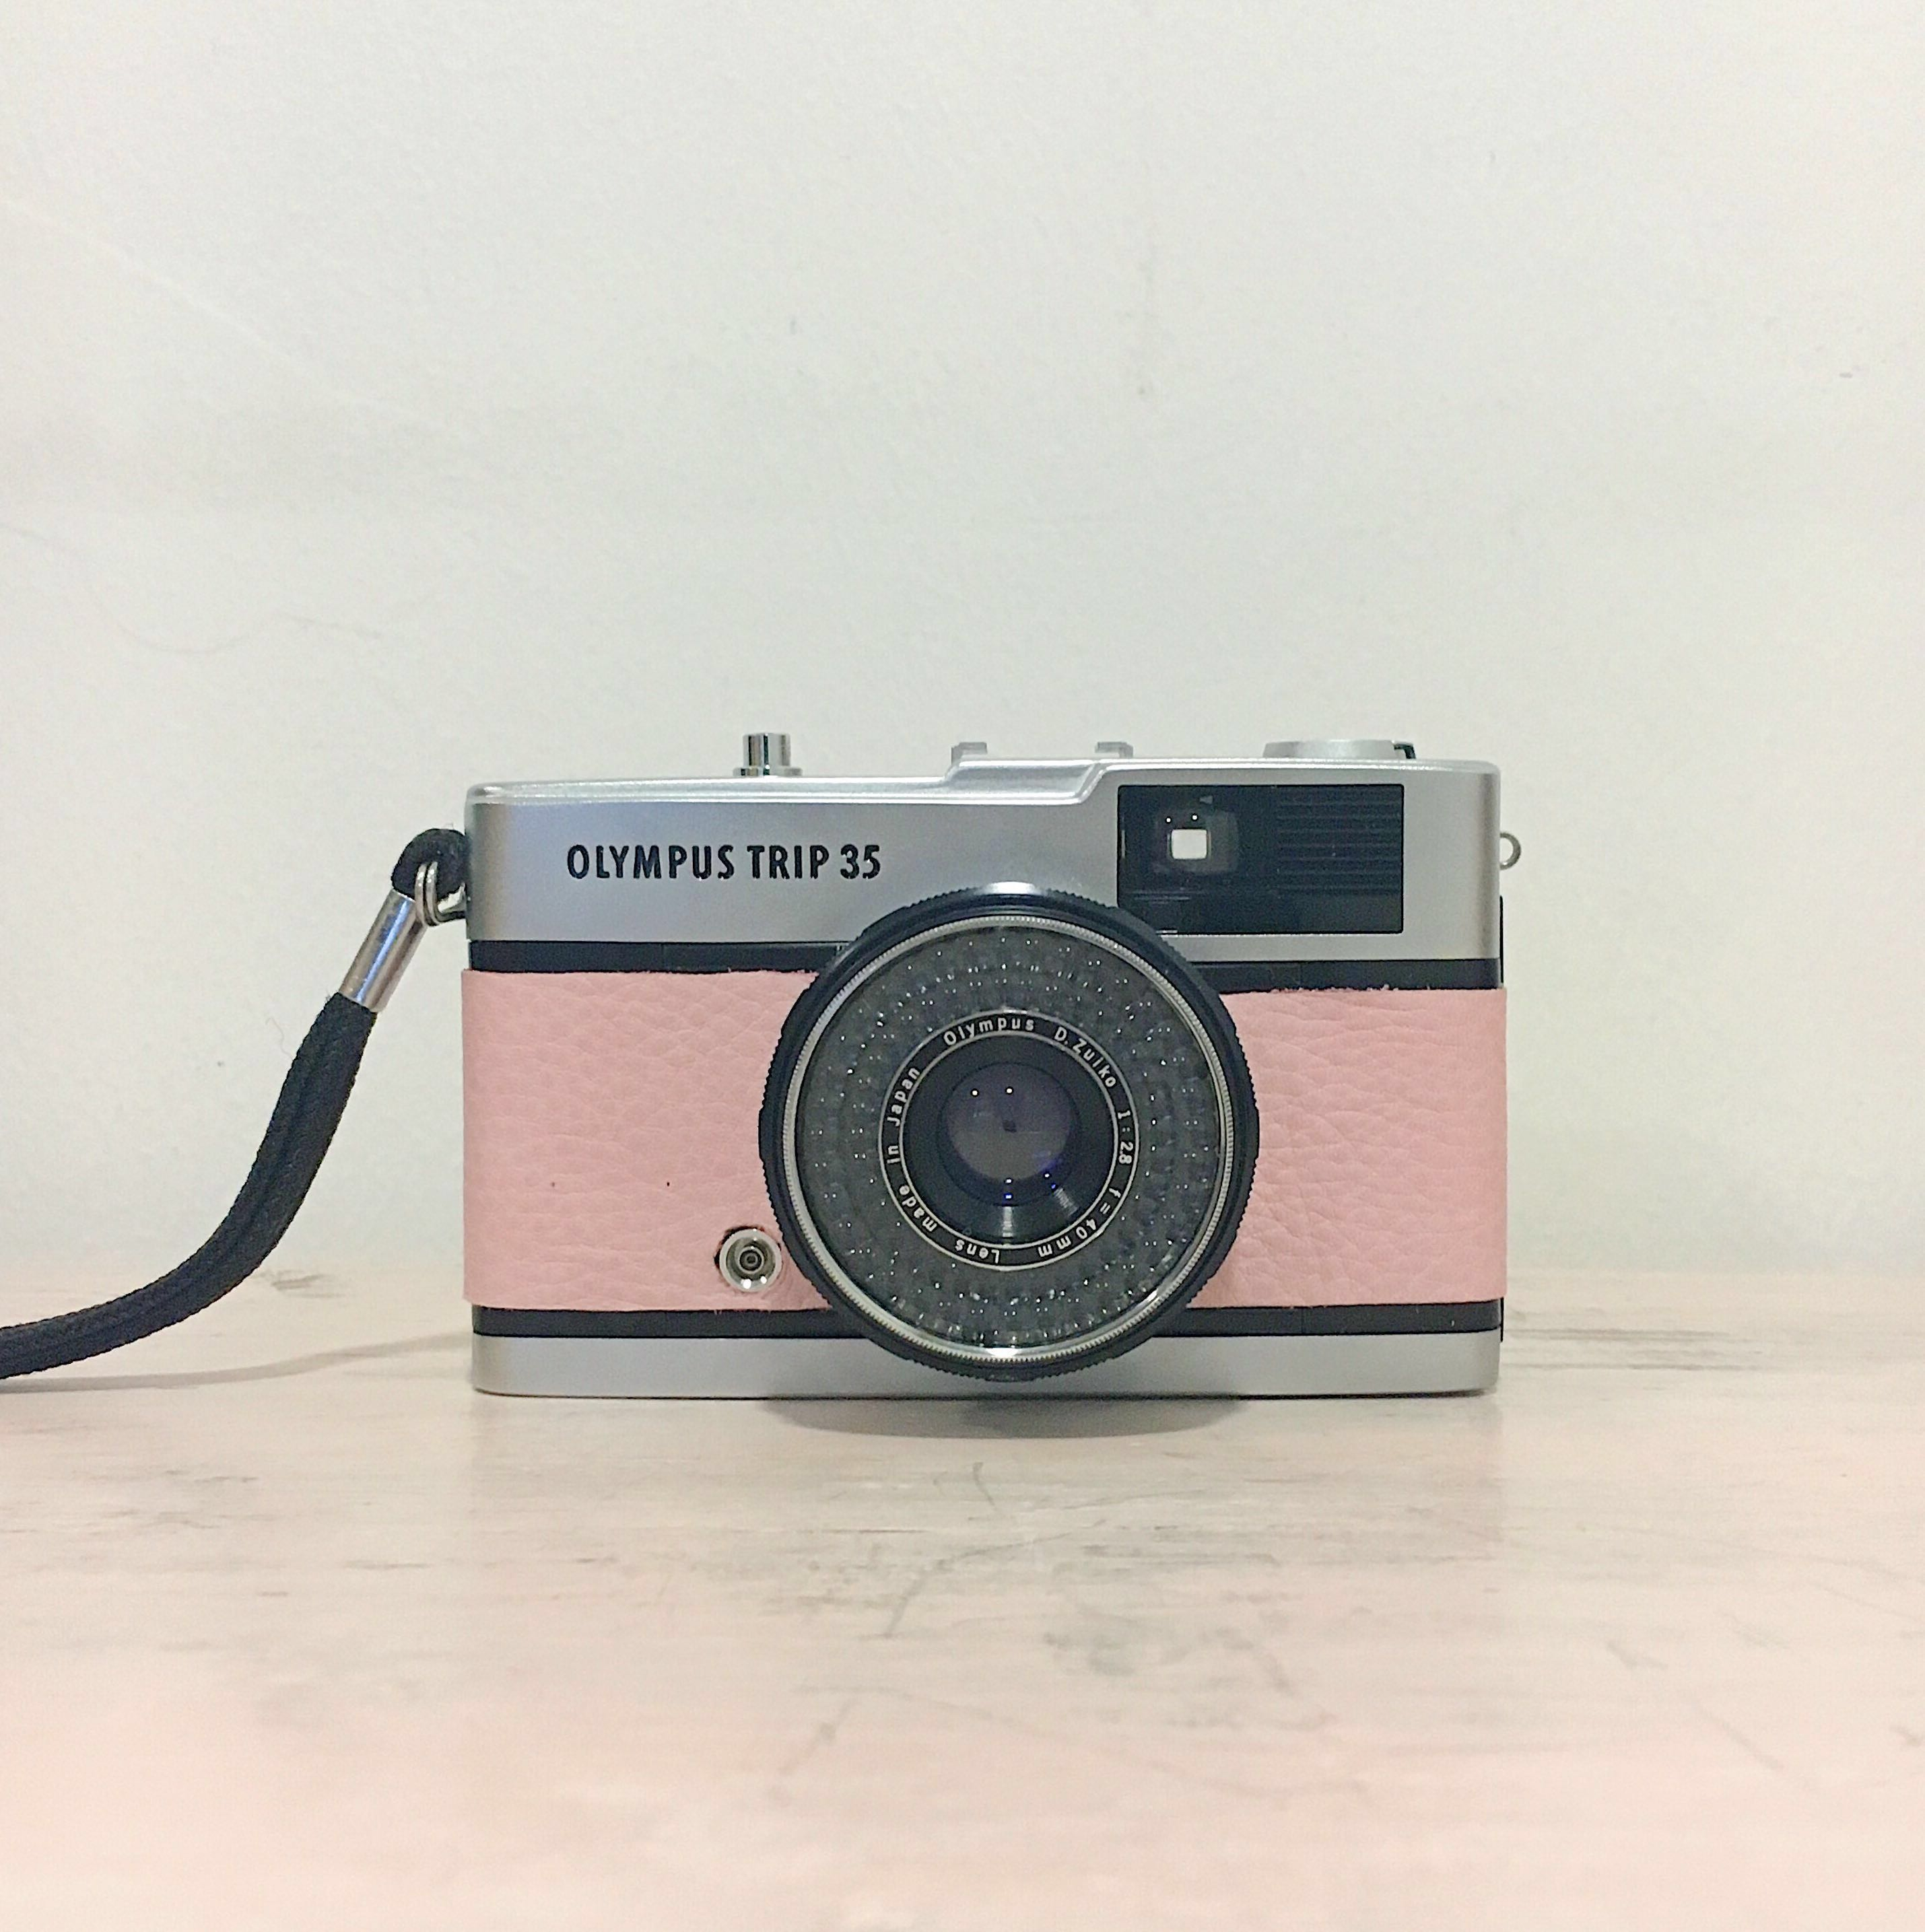 Jual Murah Olympus Om D E M5 Mark Ii Kit 12 50mm F 35 63 Ez 45mm Polytron Mesin Cuci 1 Tabung Zeromatic Belleza 75kg Paw 7513b Hitam Trip Blush Pink Vintage 35mm Film Camera